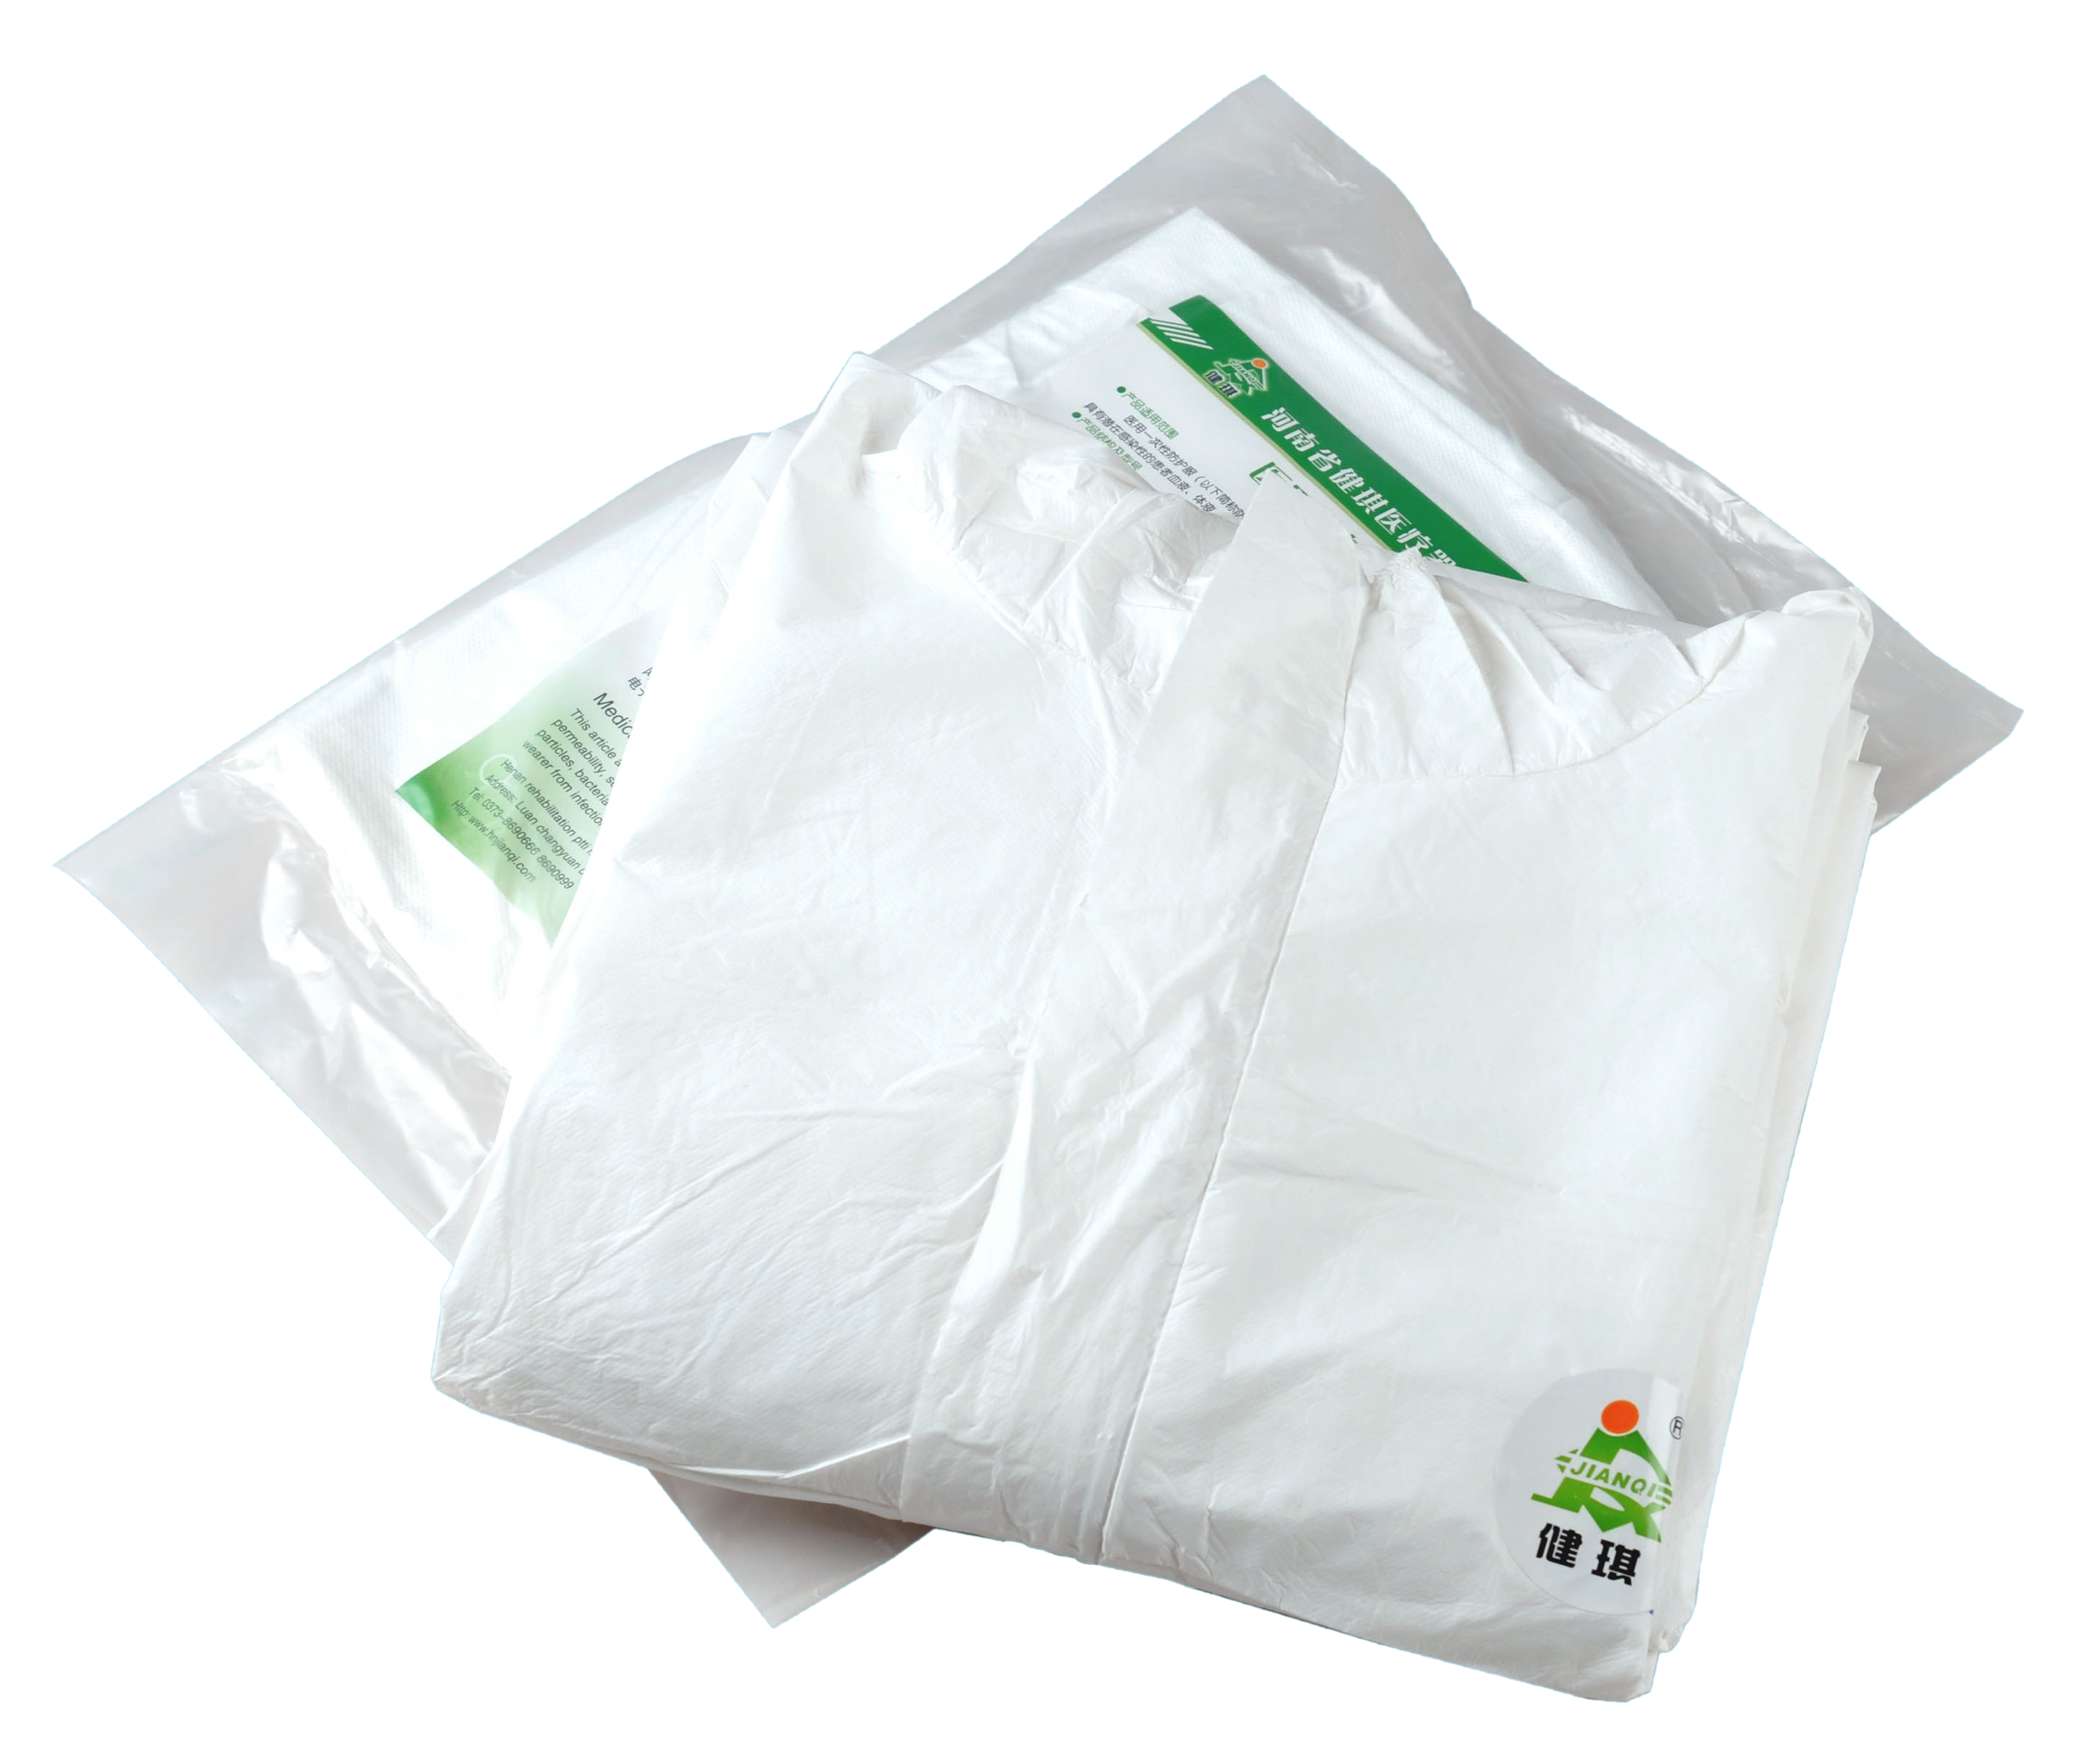 JianQi medical disposable protective clothing